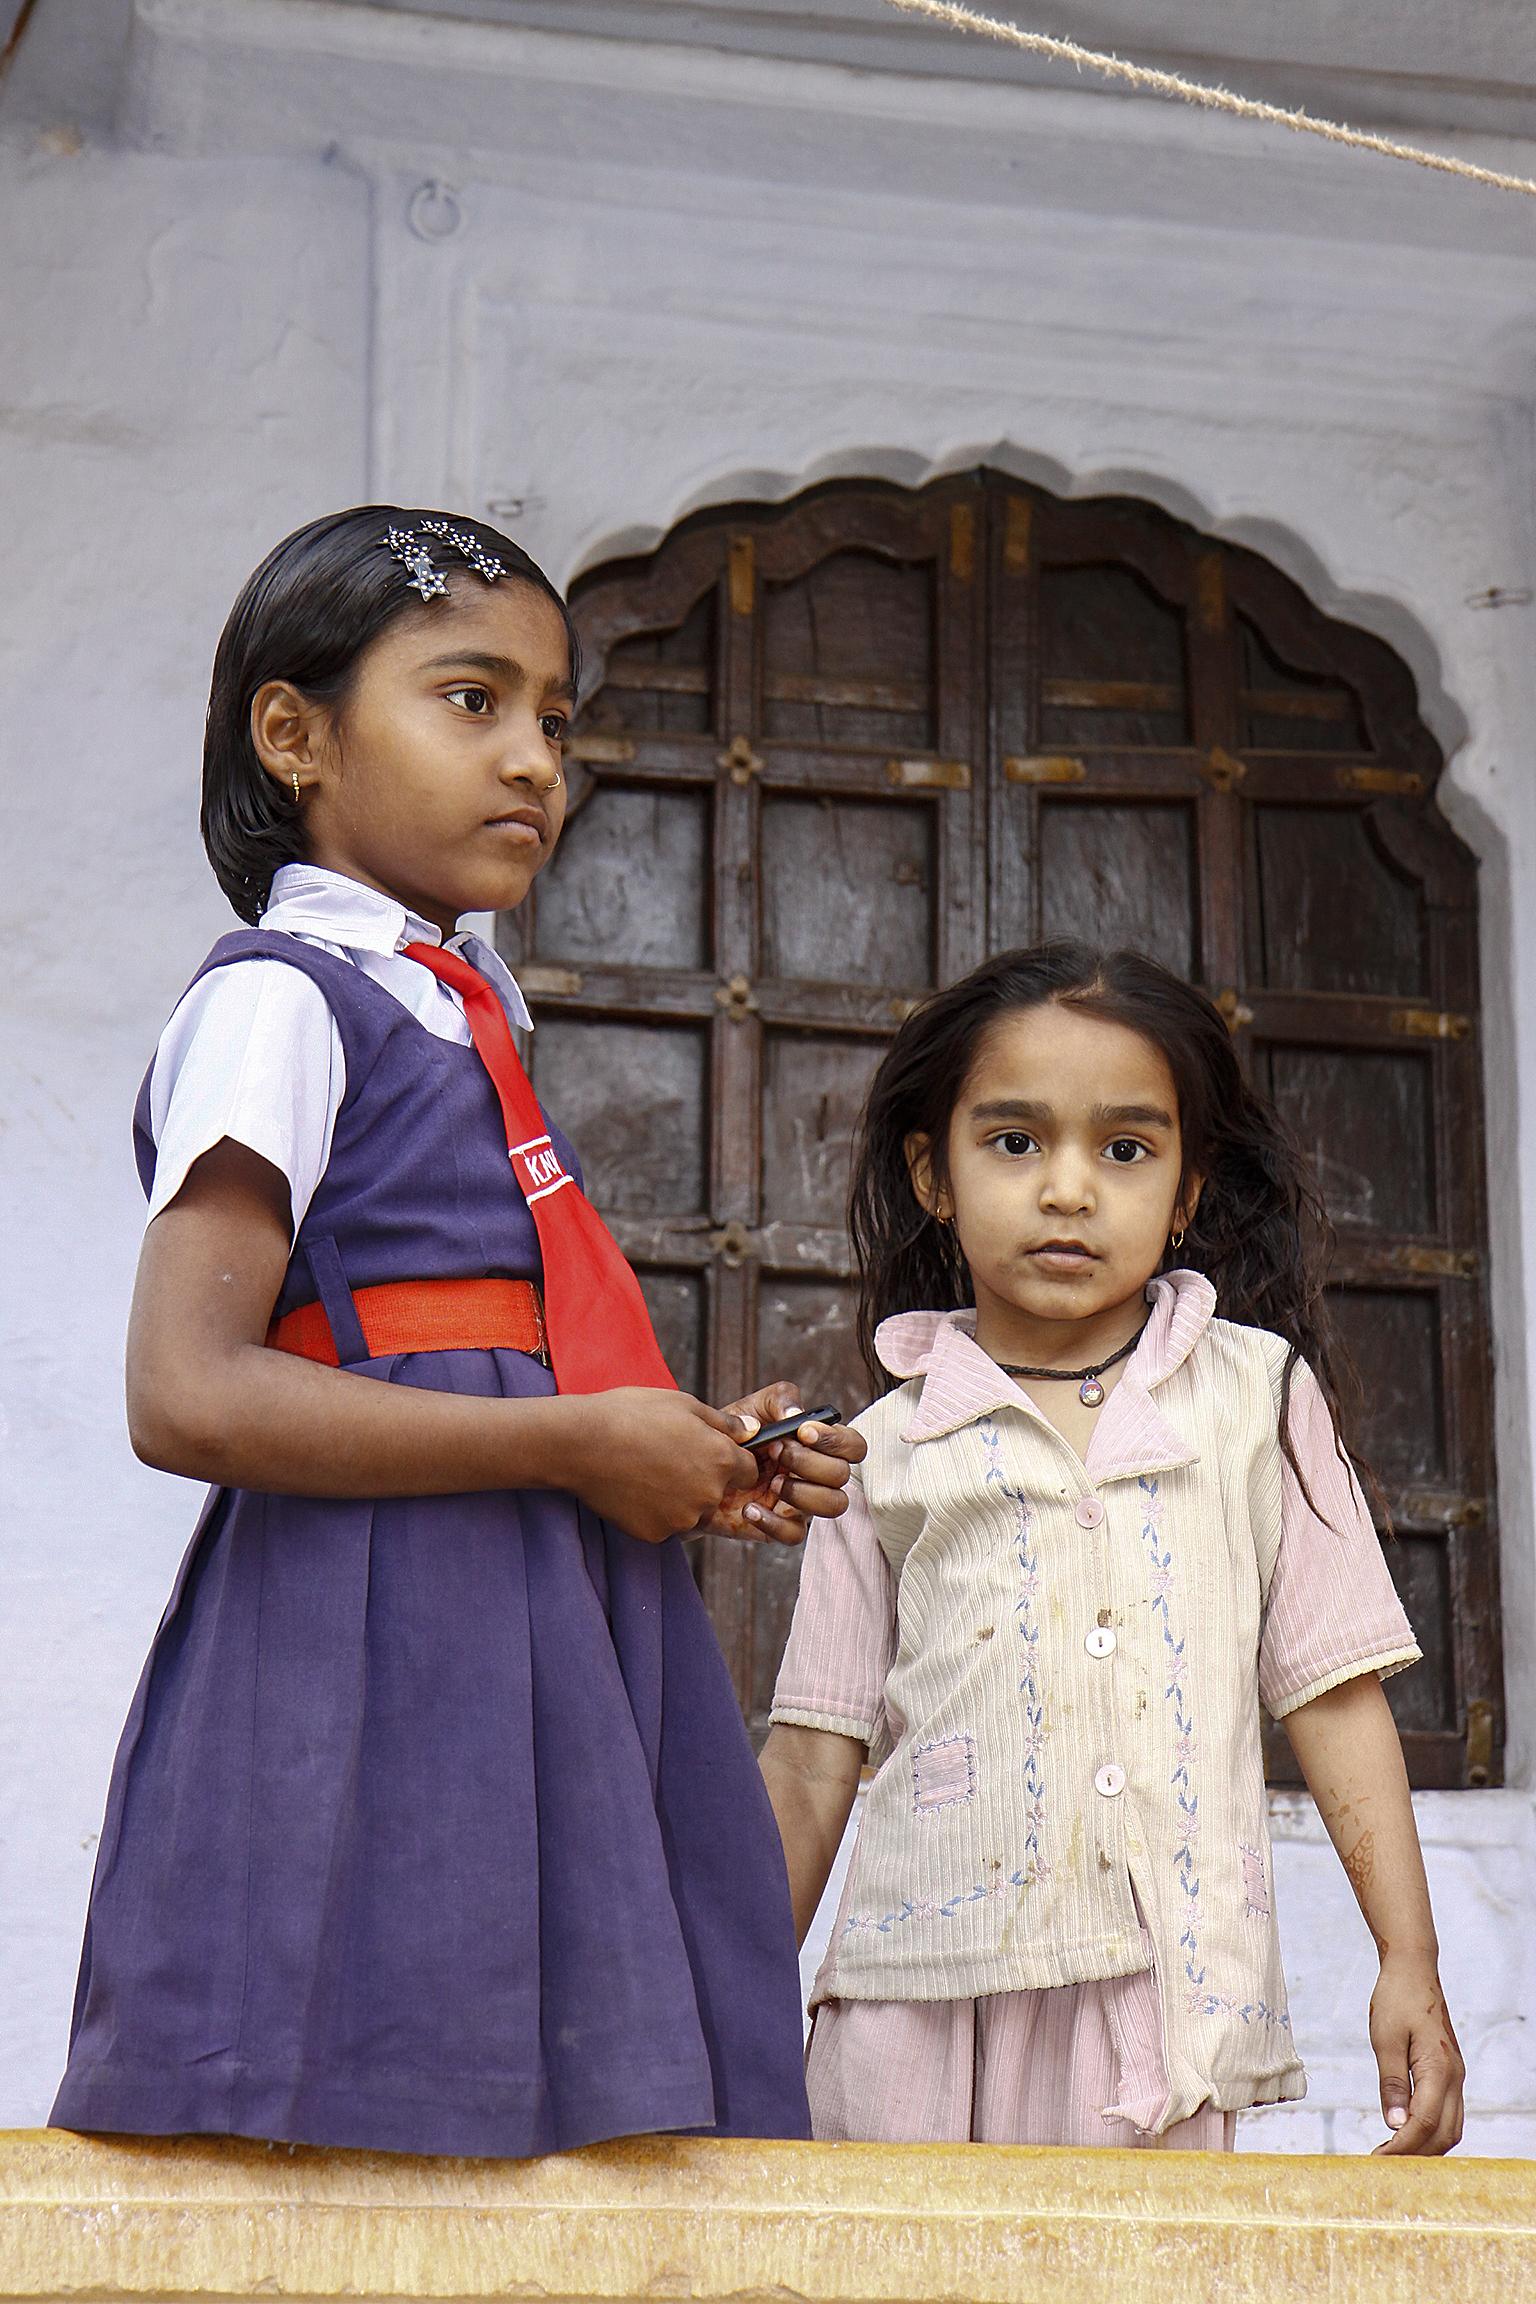 portraits-indien-inde-rajasthan-2010-marie-colette-becker-25